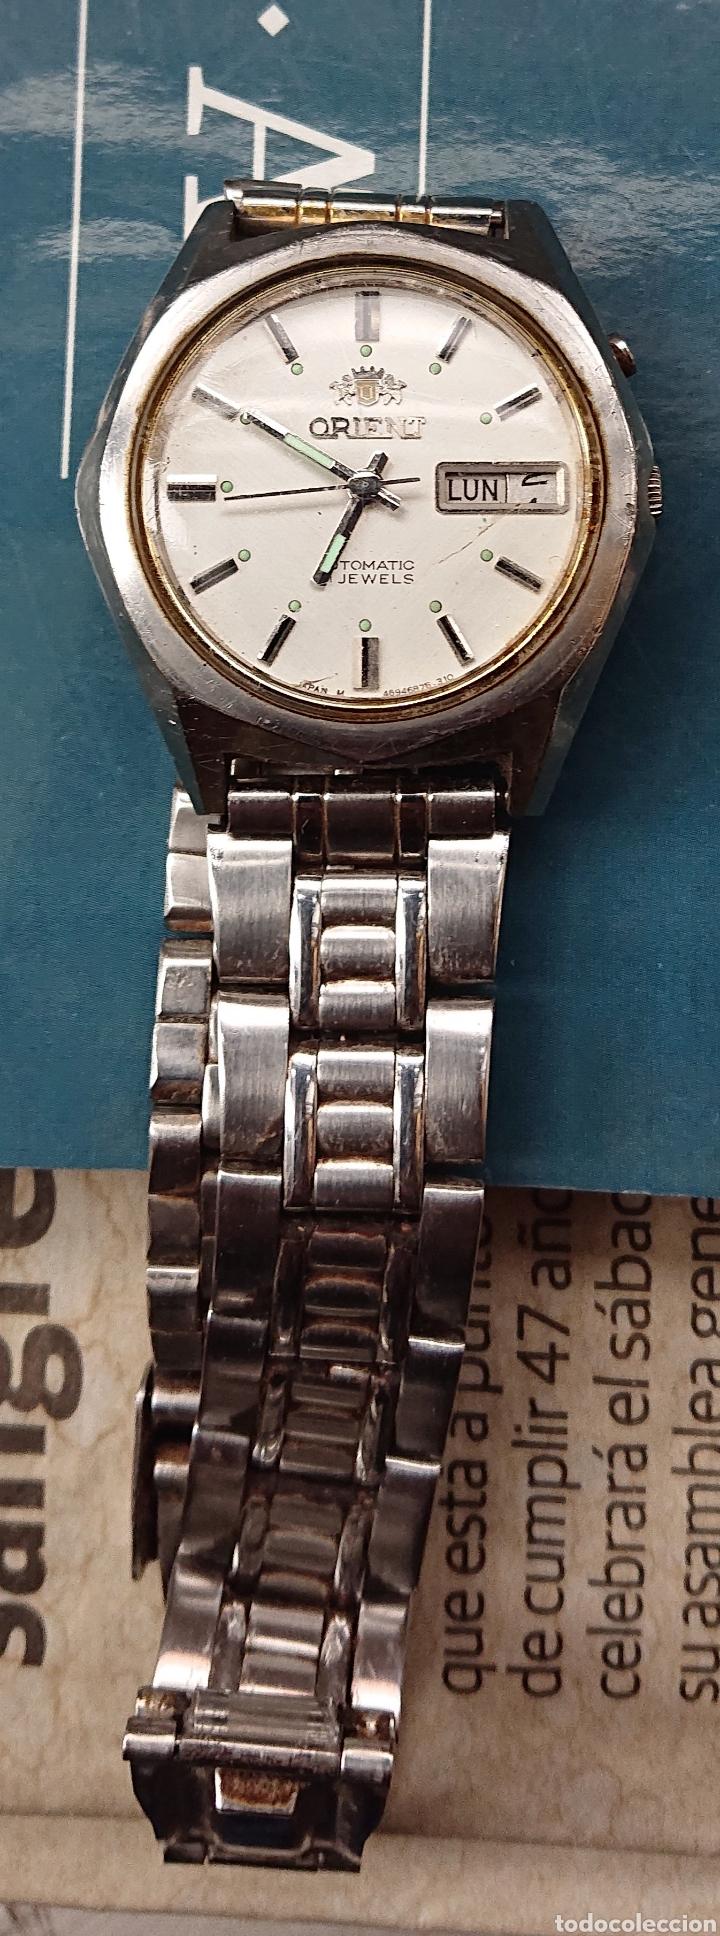 Relojes de pulsera: Lote tres relojes pulsera, seiko, orient, duward, ved fotos - Foto 2 - 141310710